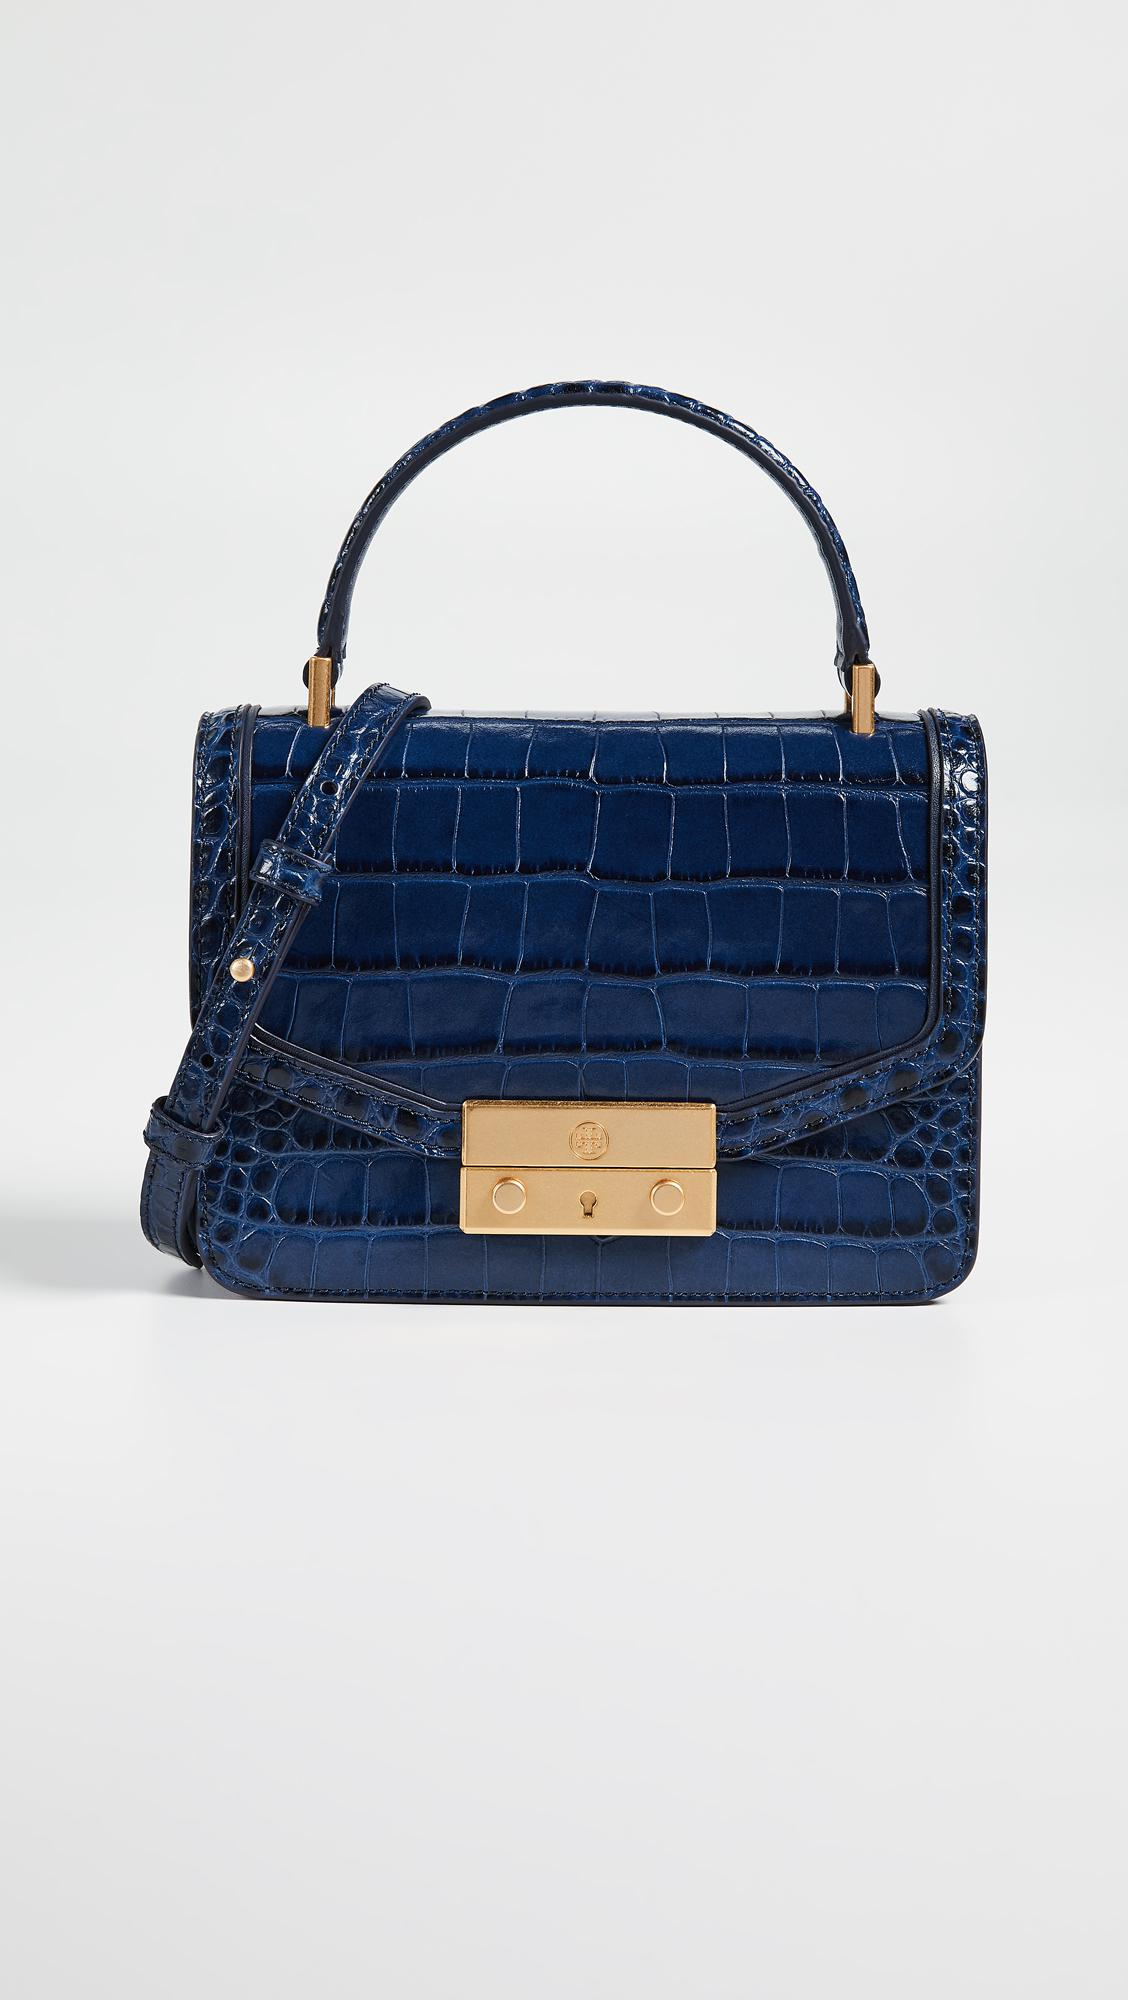 1fa8181ced99 Lyst - Tory Burch Juliette Embossed Mini Top Handle Satchel in Blue